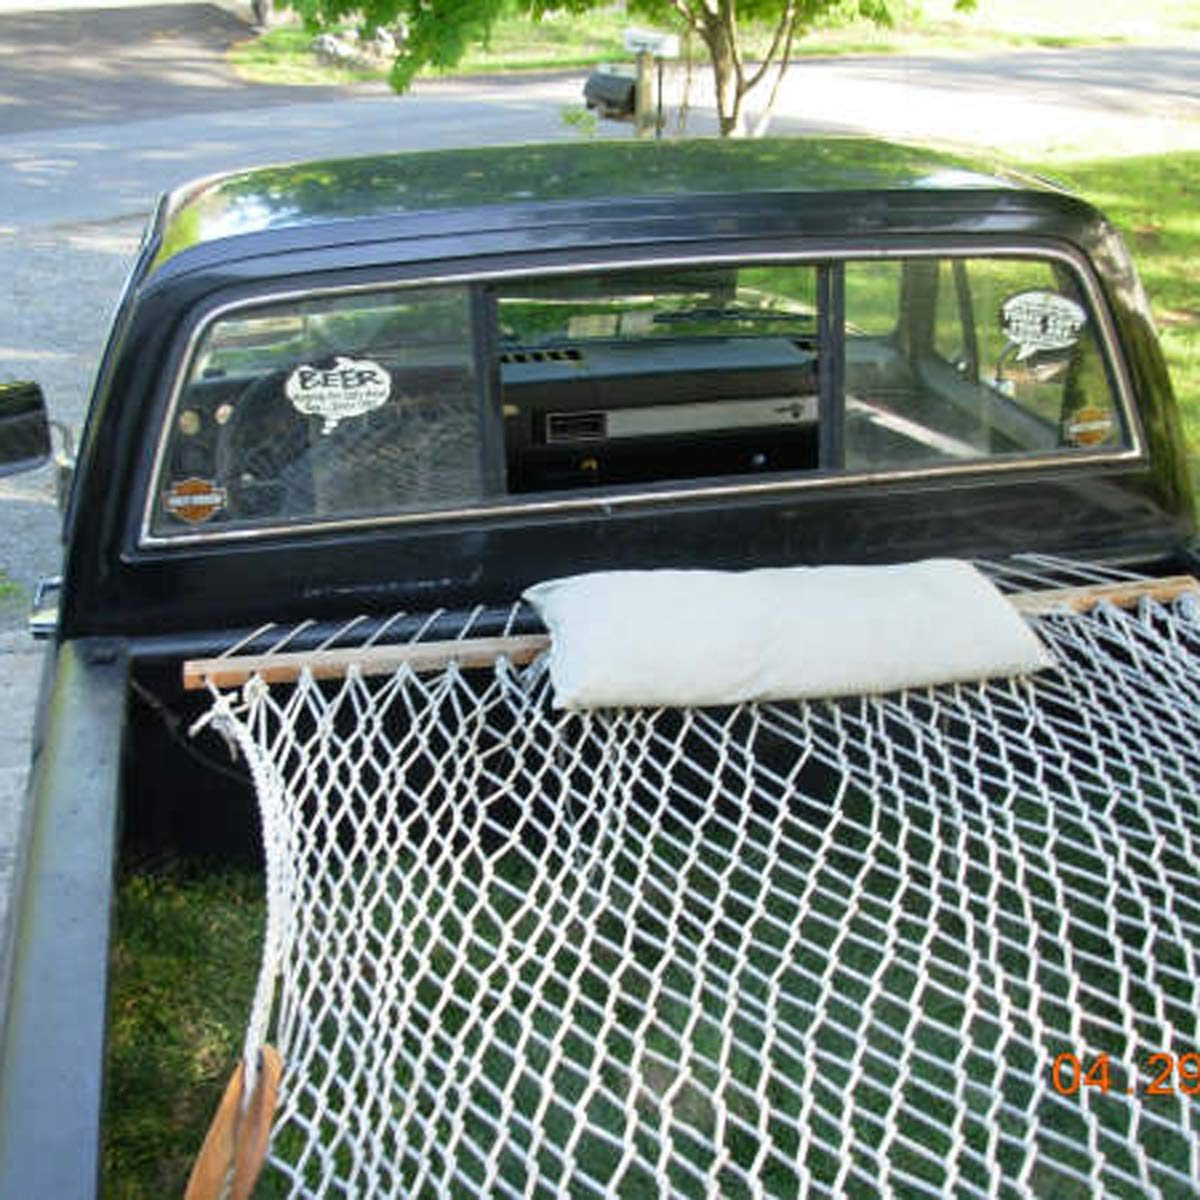 11 Pickup Truck Bed Hacks | The Family Handyman